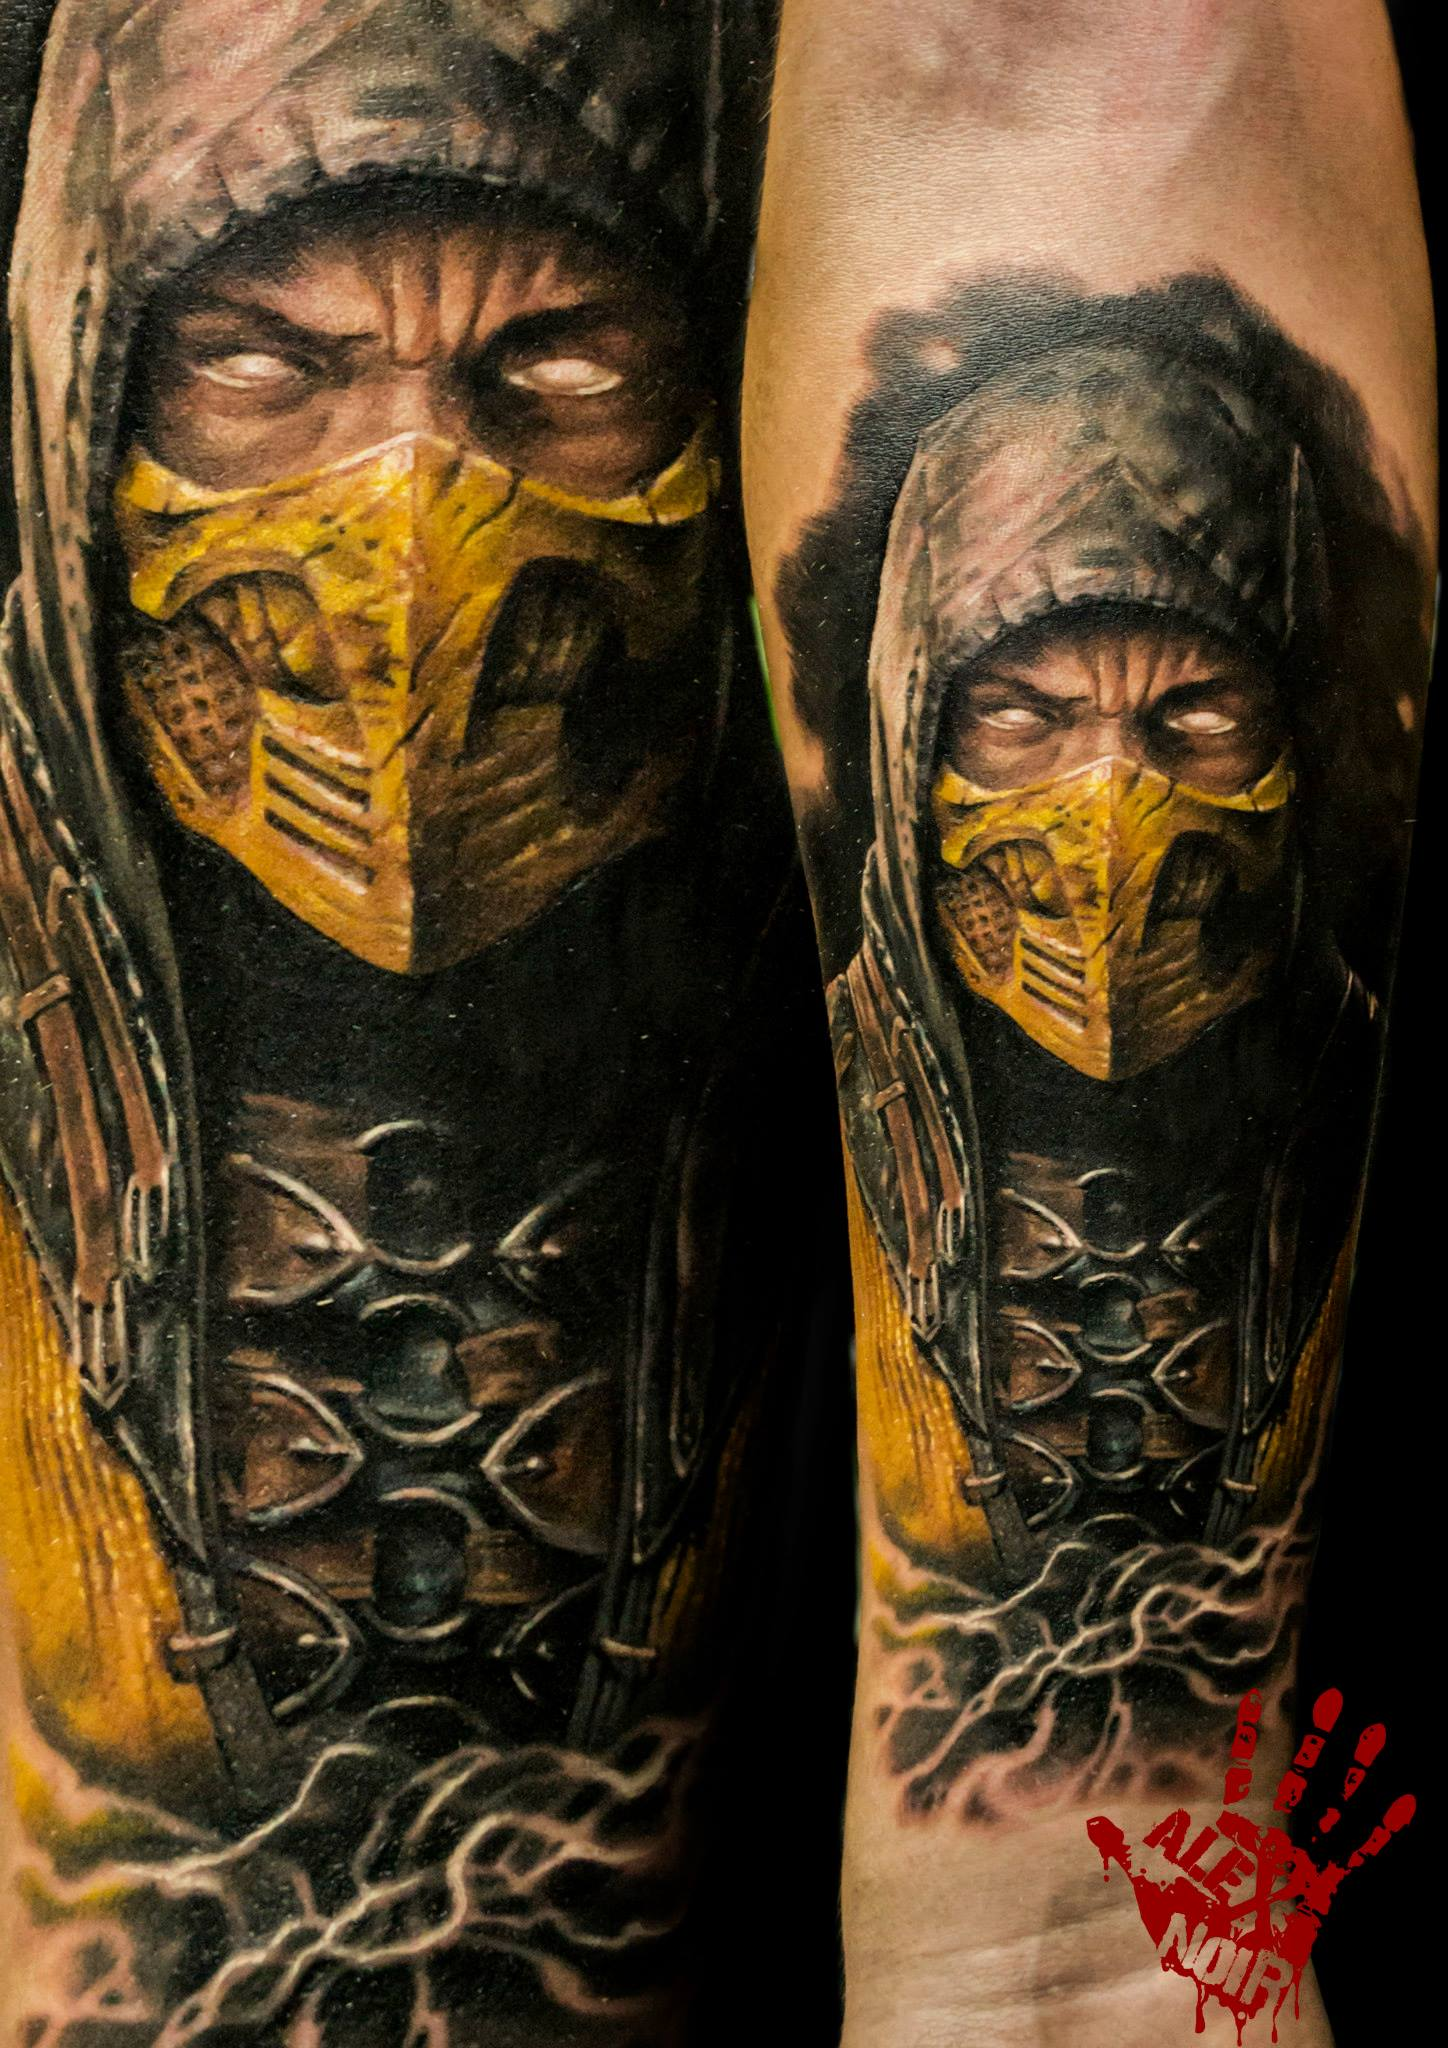 Liu Kang Tattoo: Scorpion (Mortal Kombat)